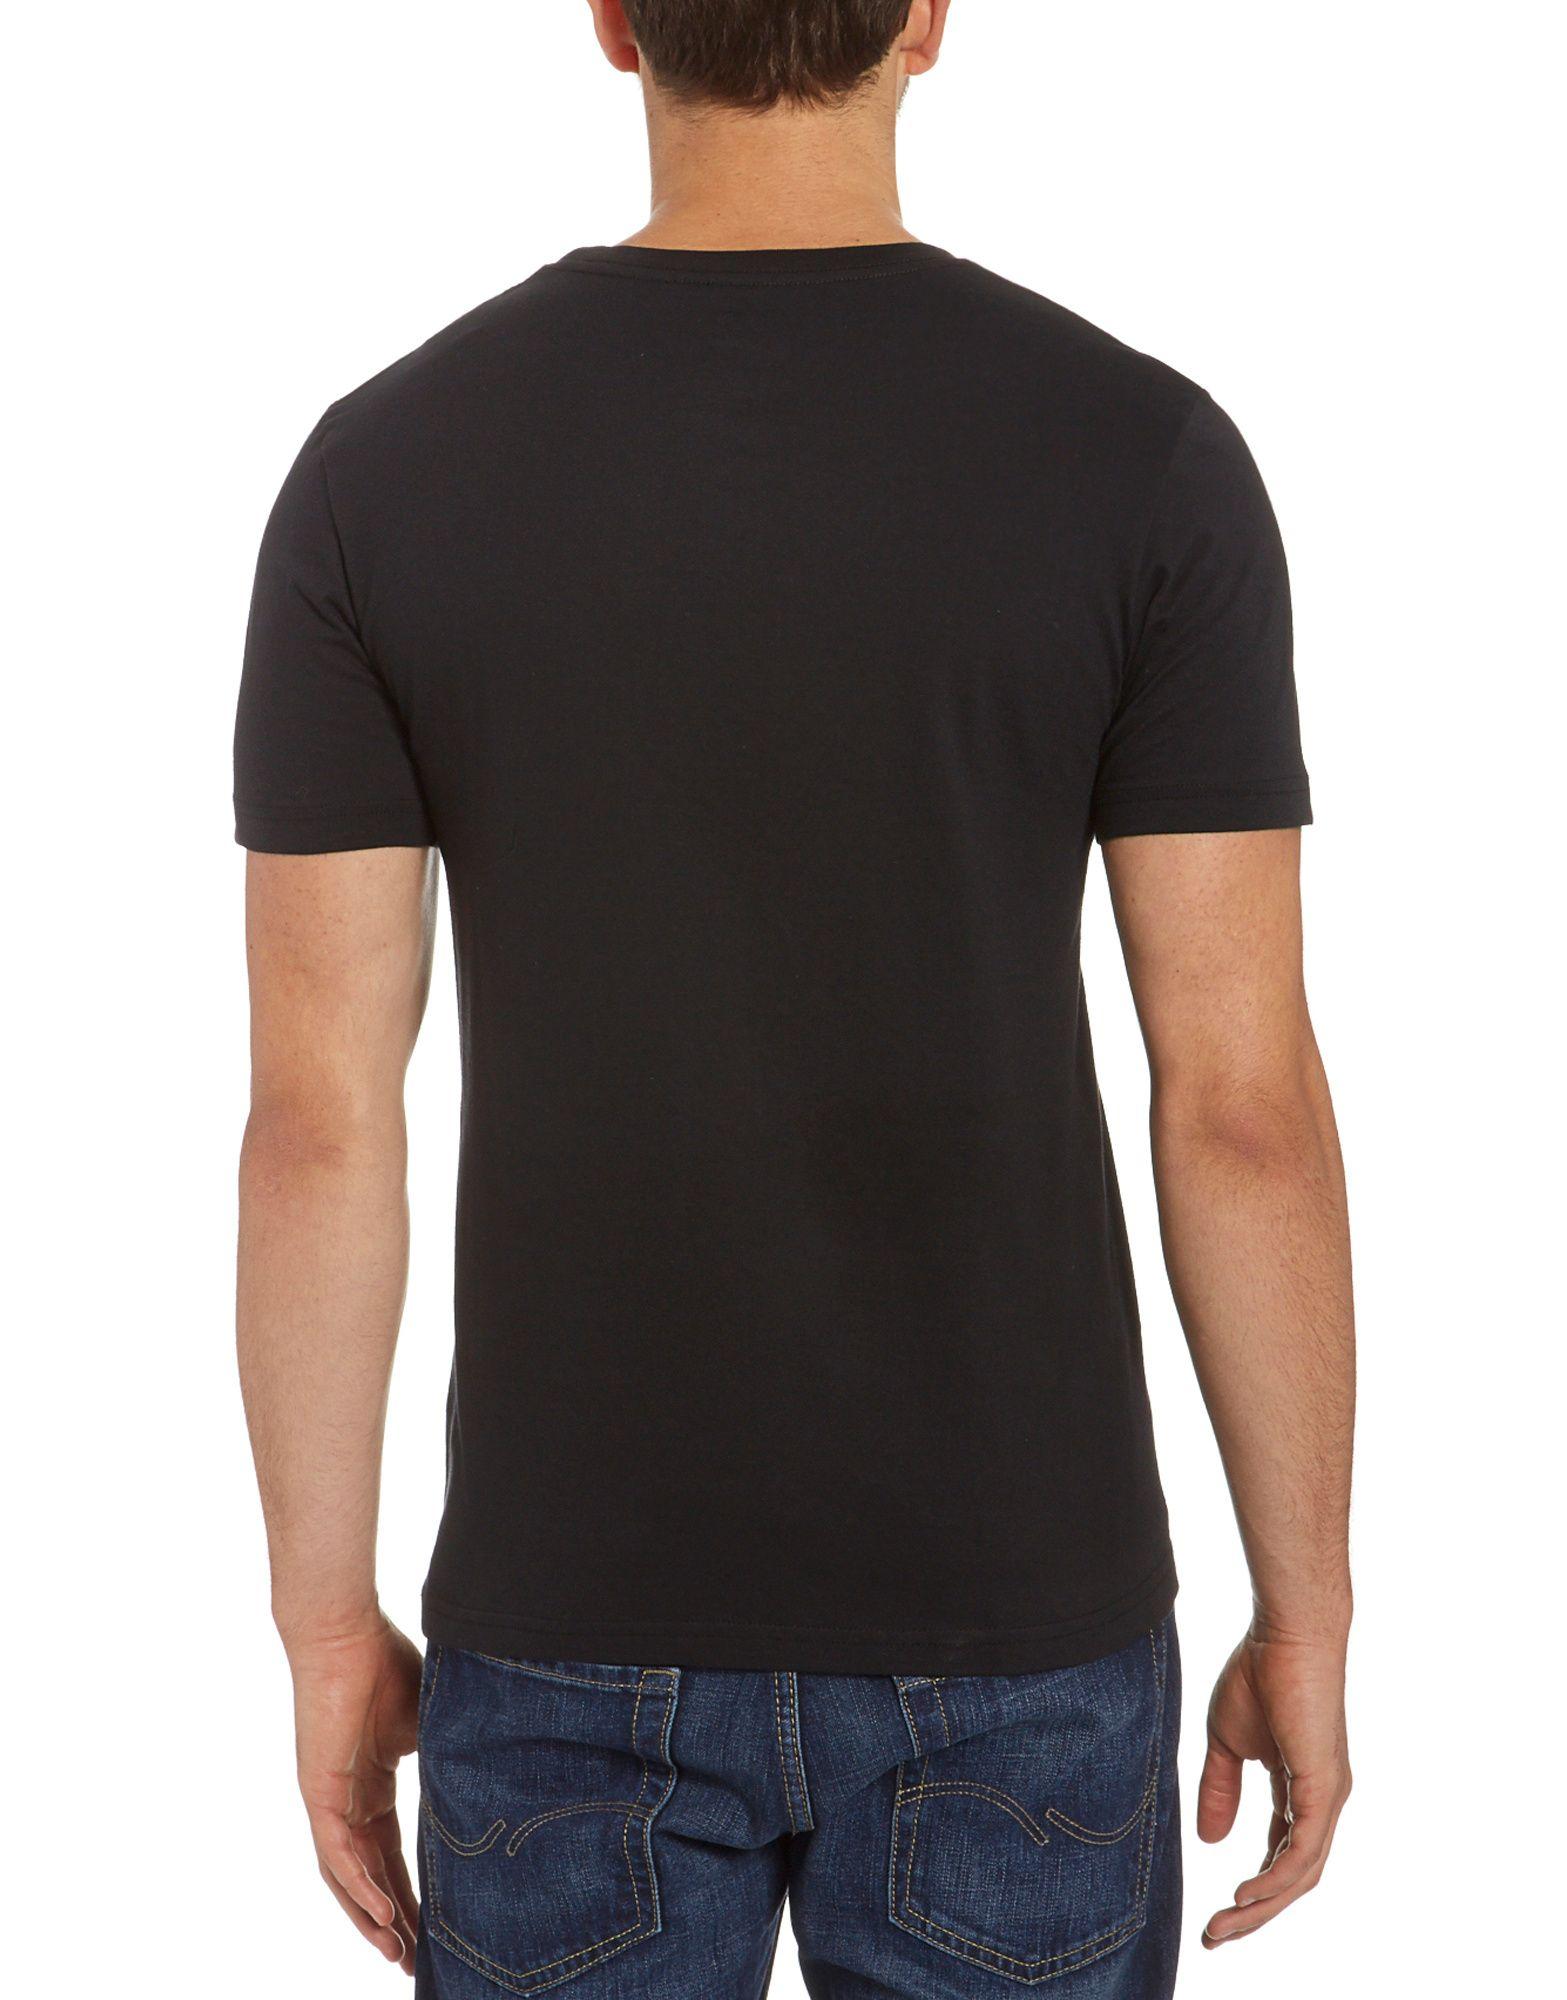 Nike Galaxy Explode T-Shirt